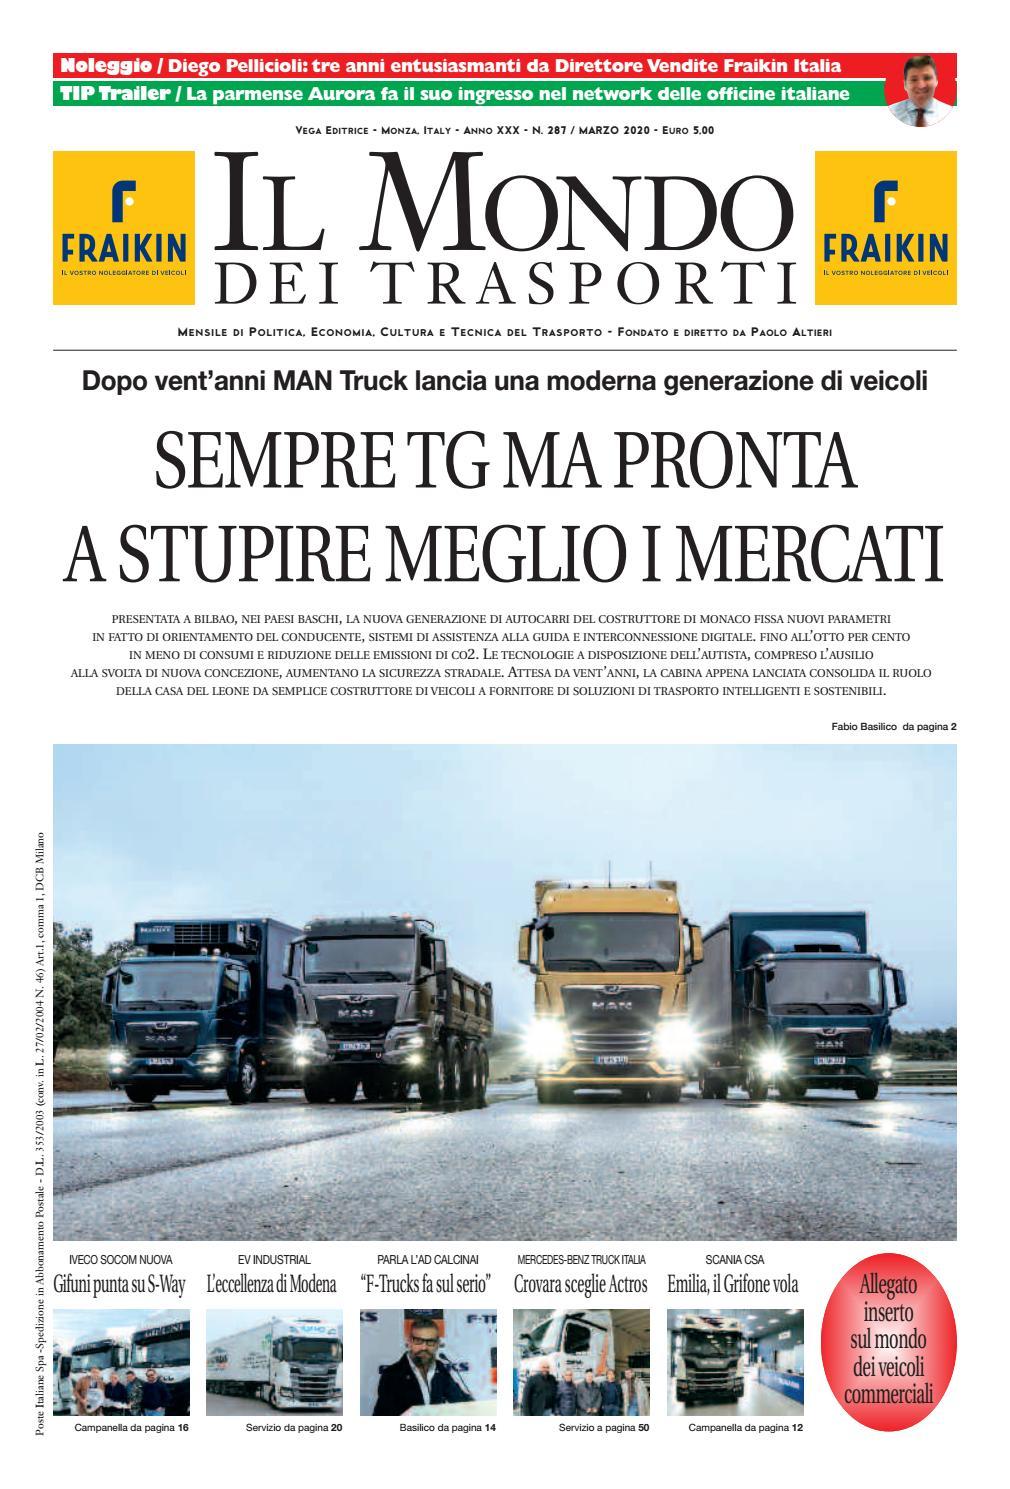 Isola Ecologica San Felice Sul Panaro il mondo dei trasporti - marzo 2020vega editrice - issuu